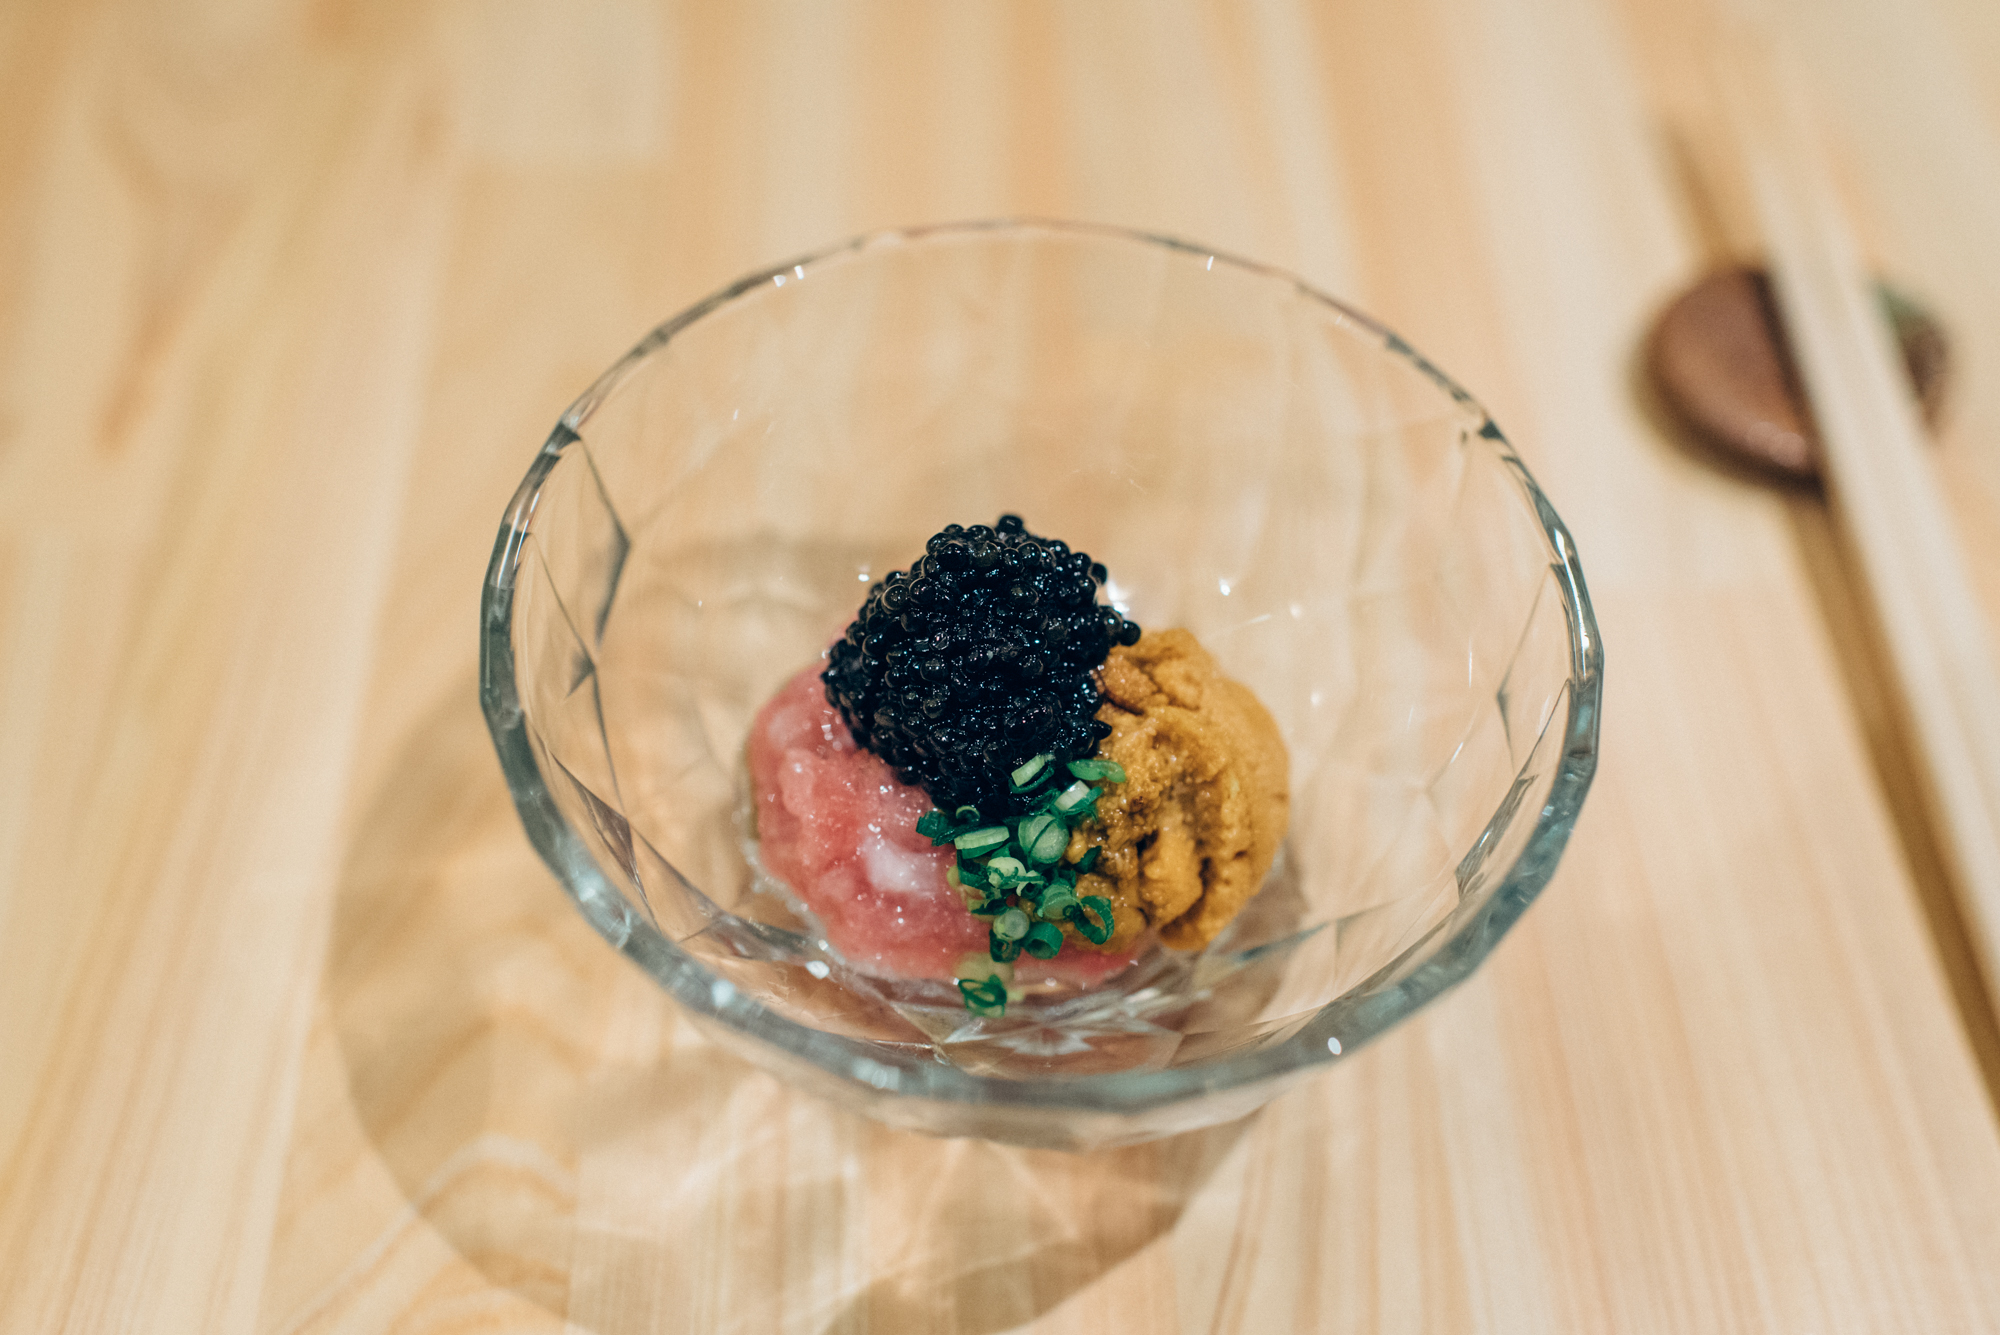 toronto-omakase-sushi-shoushin-11.jpg